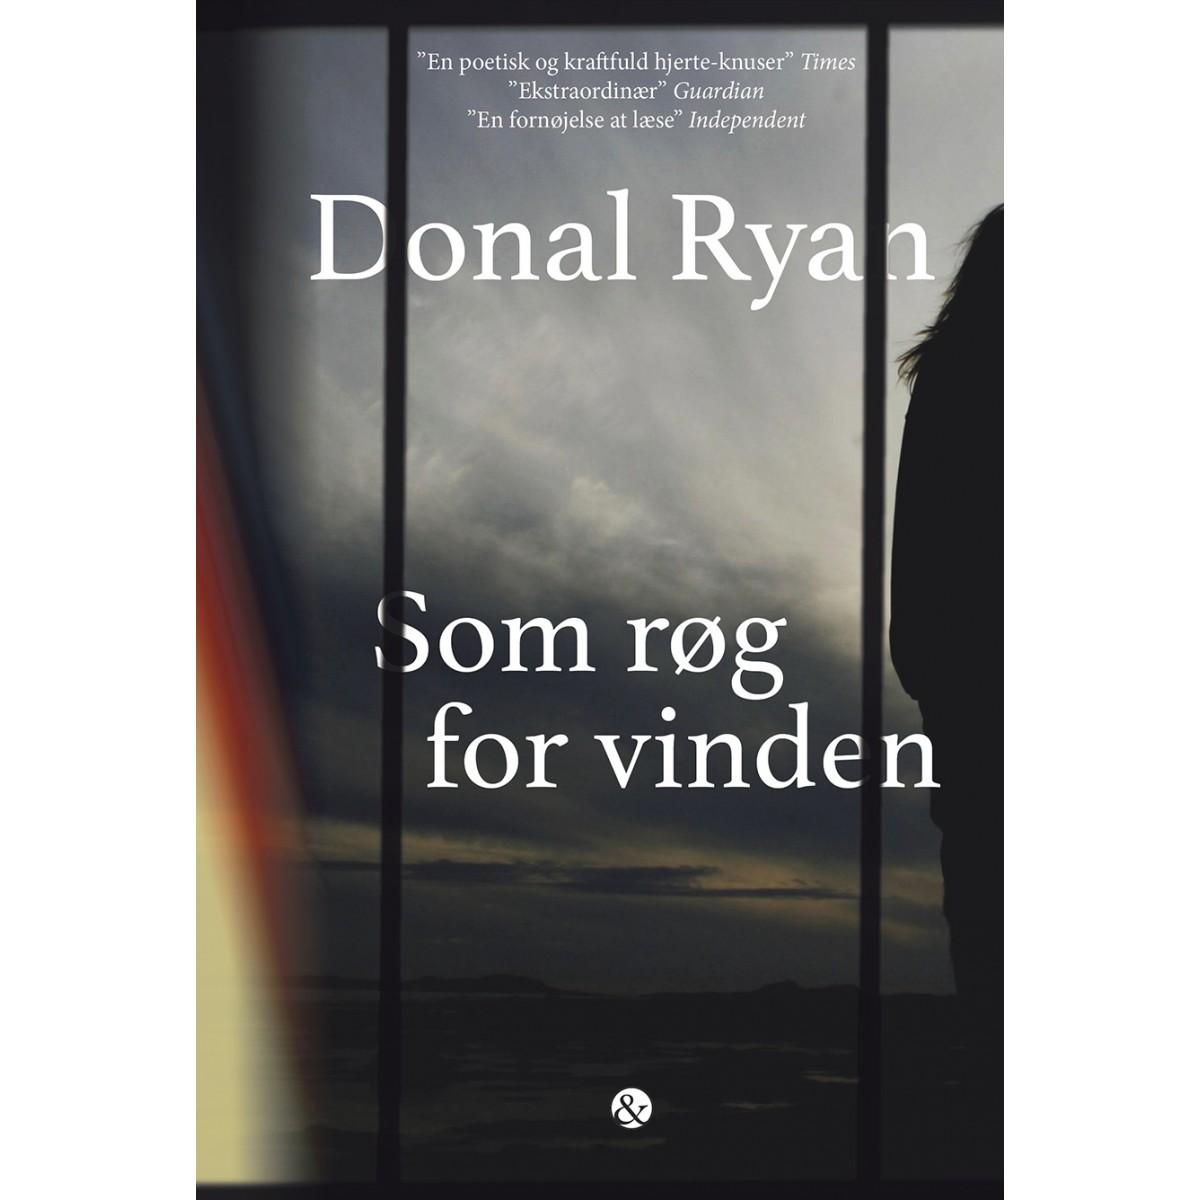 Donal Ryan: Som røg for vinden